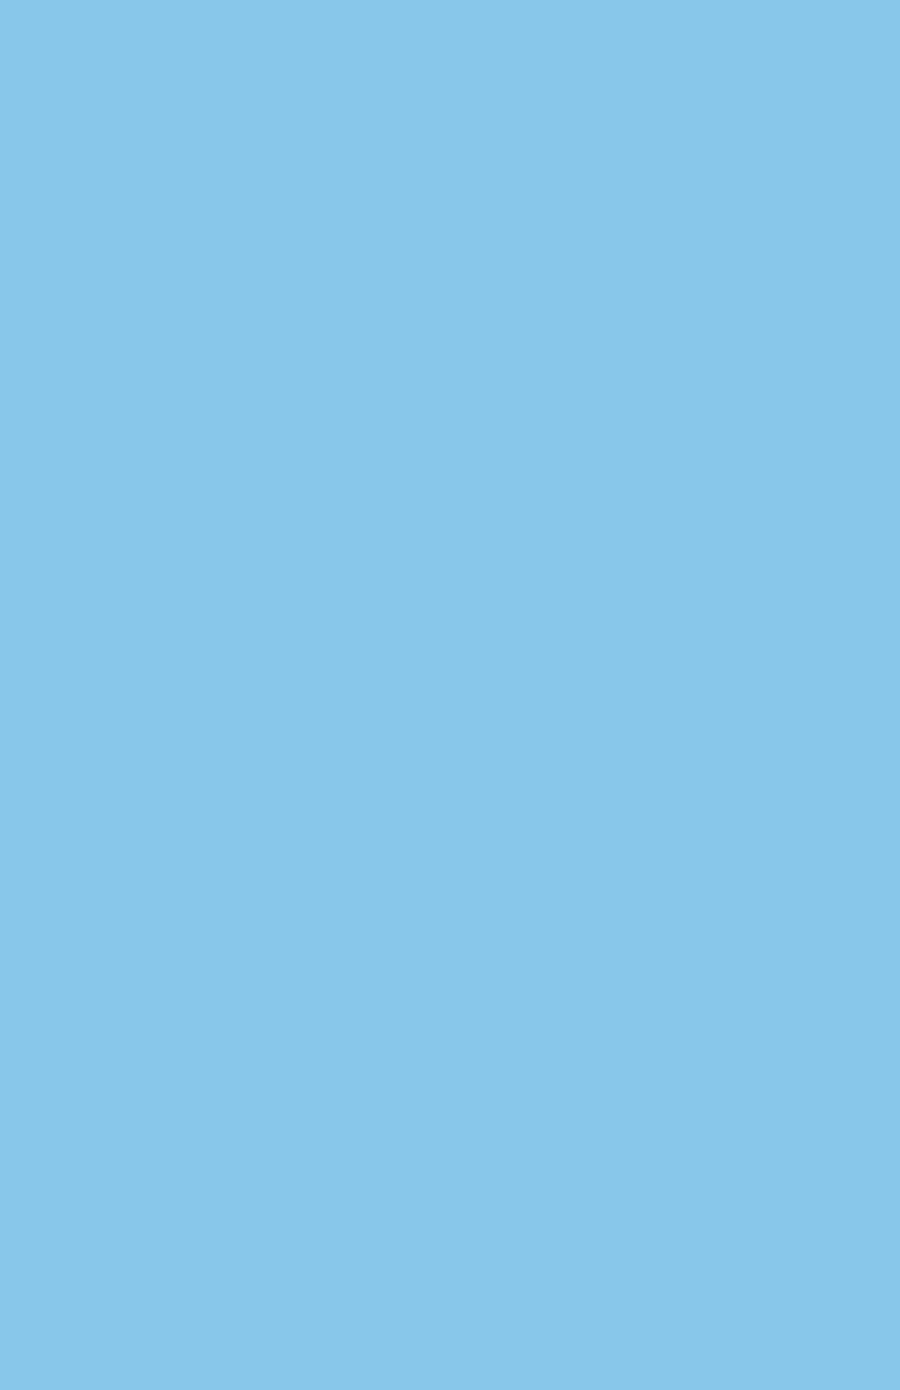 Light-Blue-Block-photo-900x1390.jpg